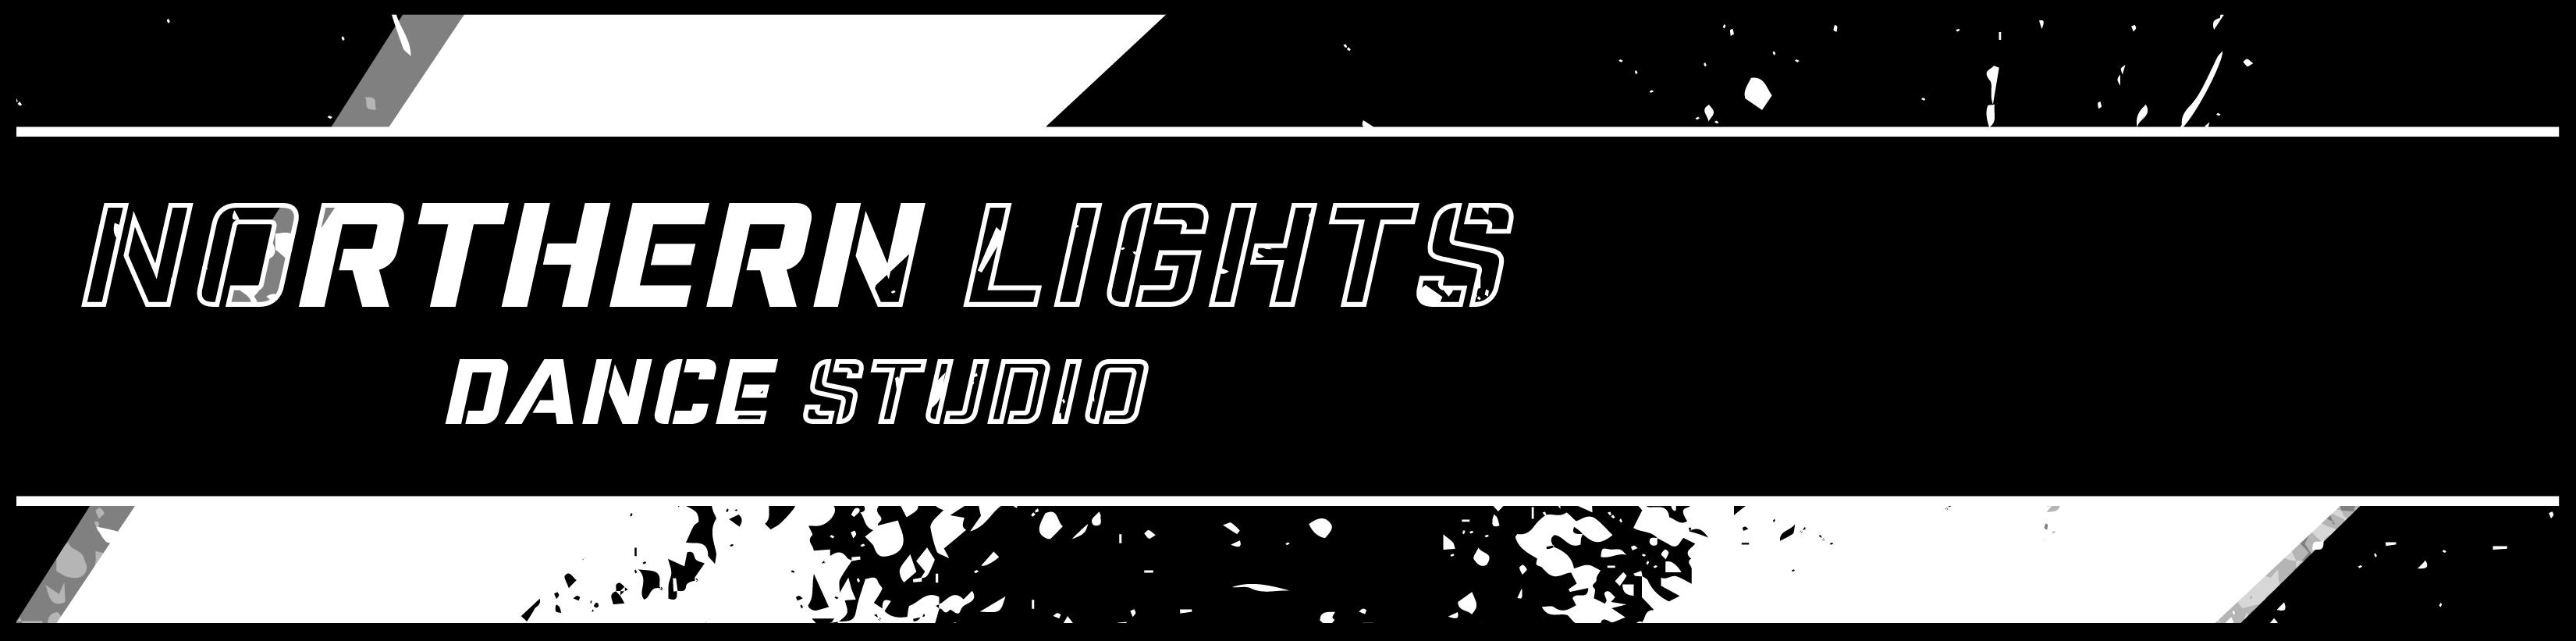 Northern Lights Dance Studio